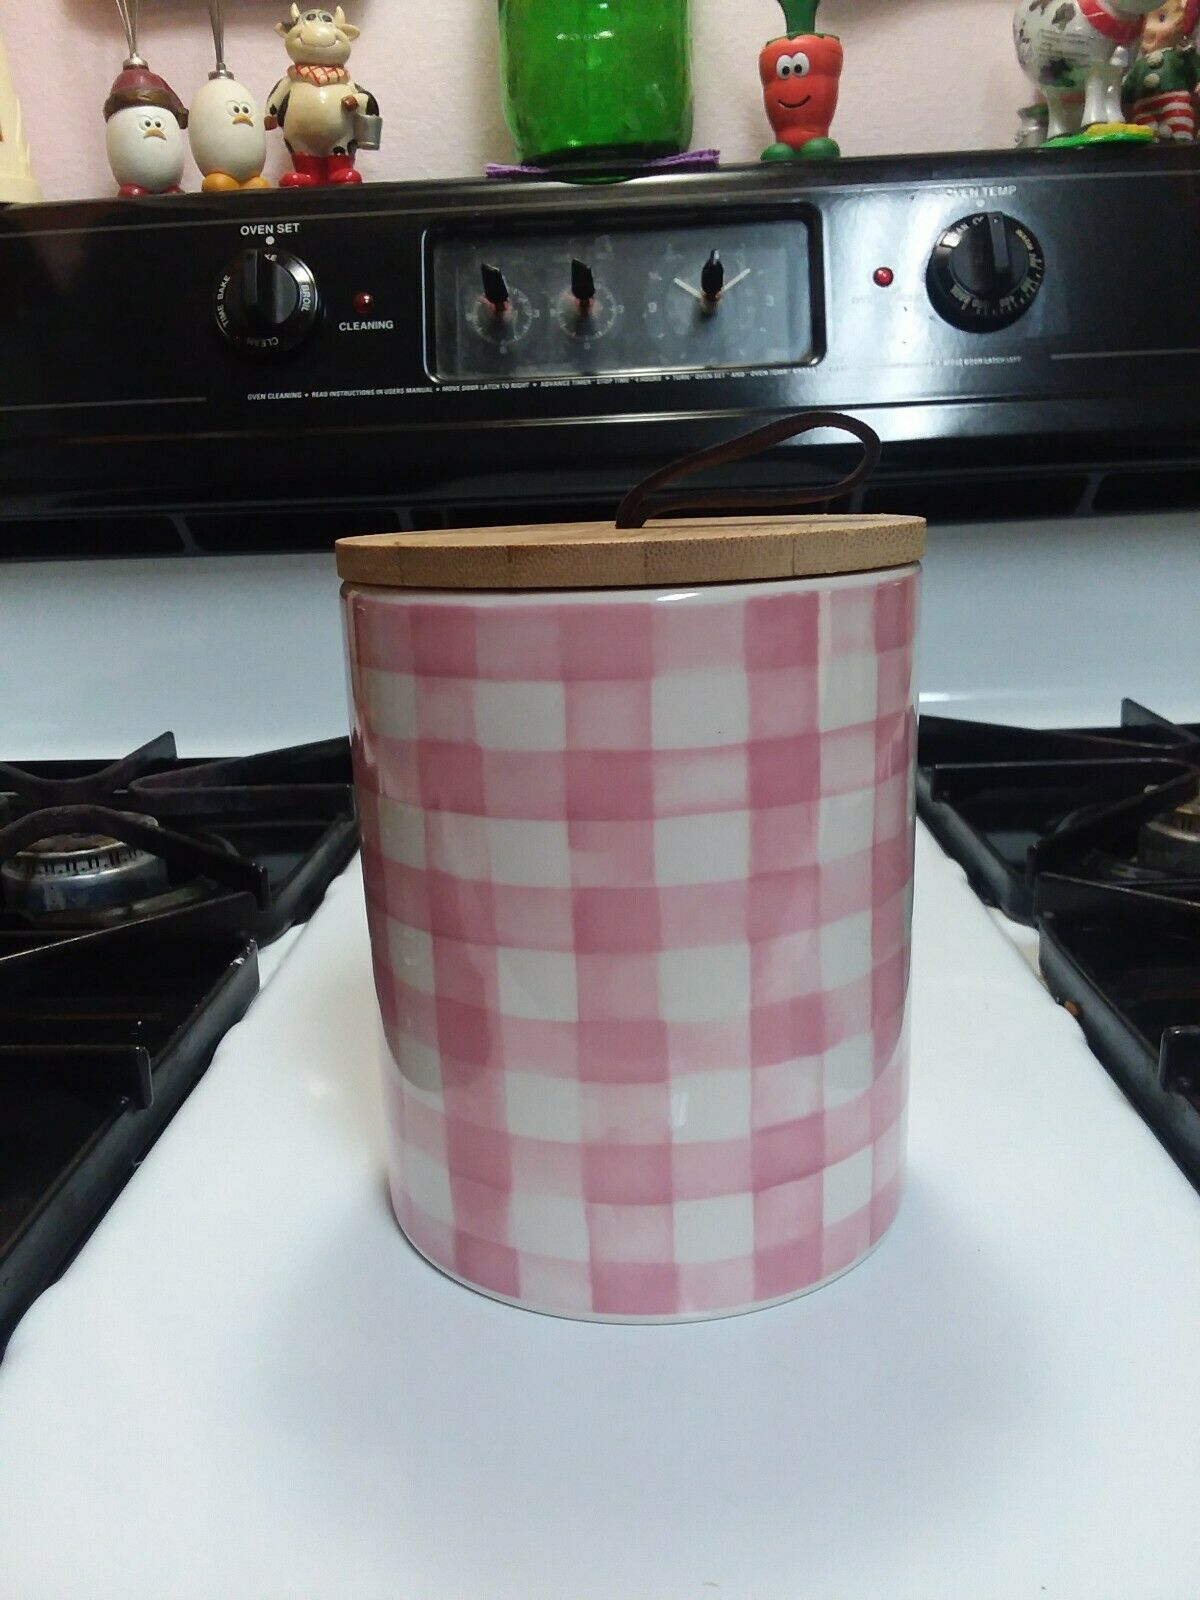 Hobby Lobby Kitchen Decor Ceramic Canister Red Bird Jar Lid Chalkboard Label 12 For Sale Online Ebay